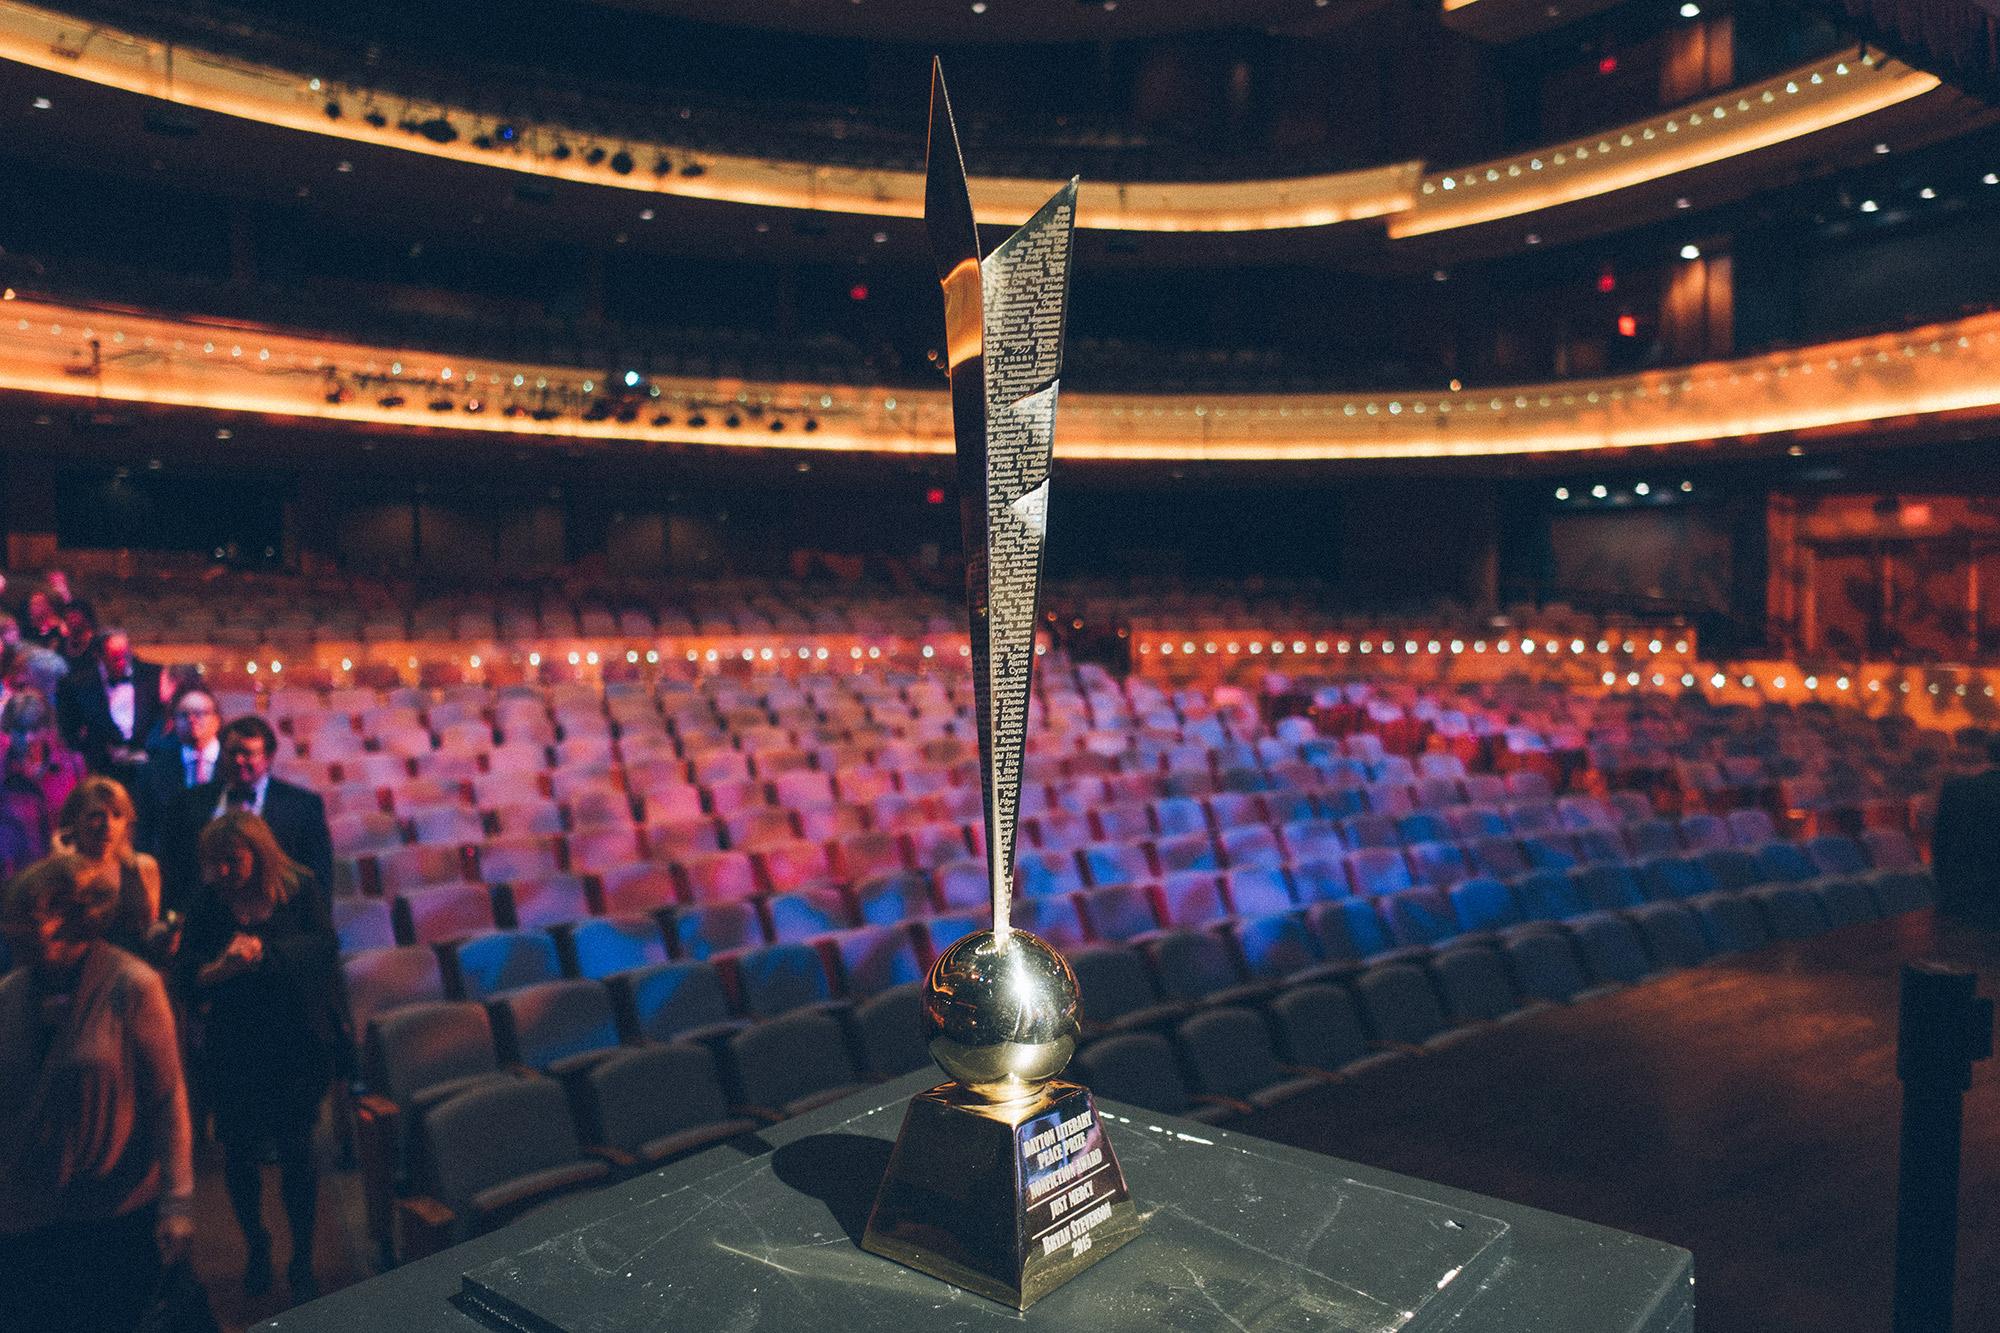 Dayton Literary Peace Prize Award